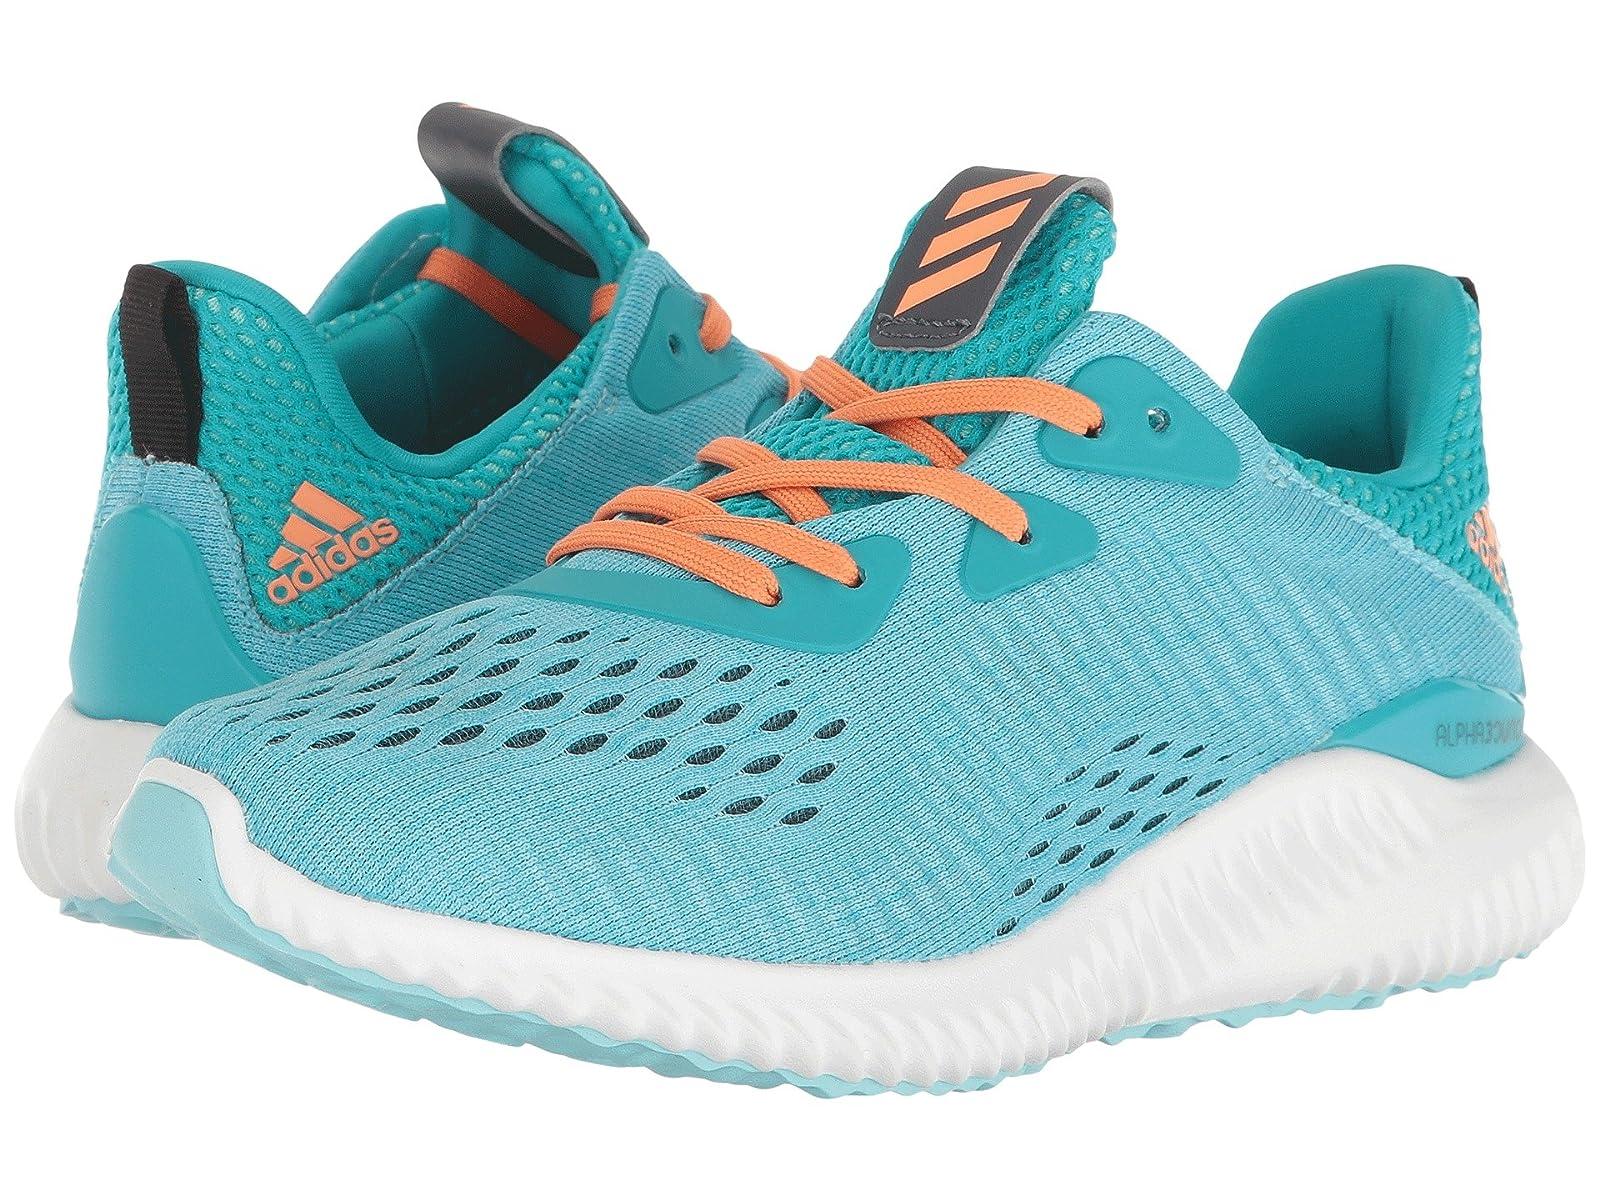 adidas Kids Alphabounce EM (Big Kid)Stylish and characteristic shoes